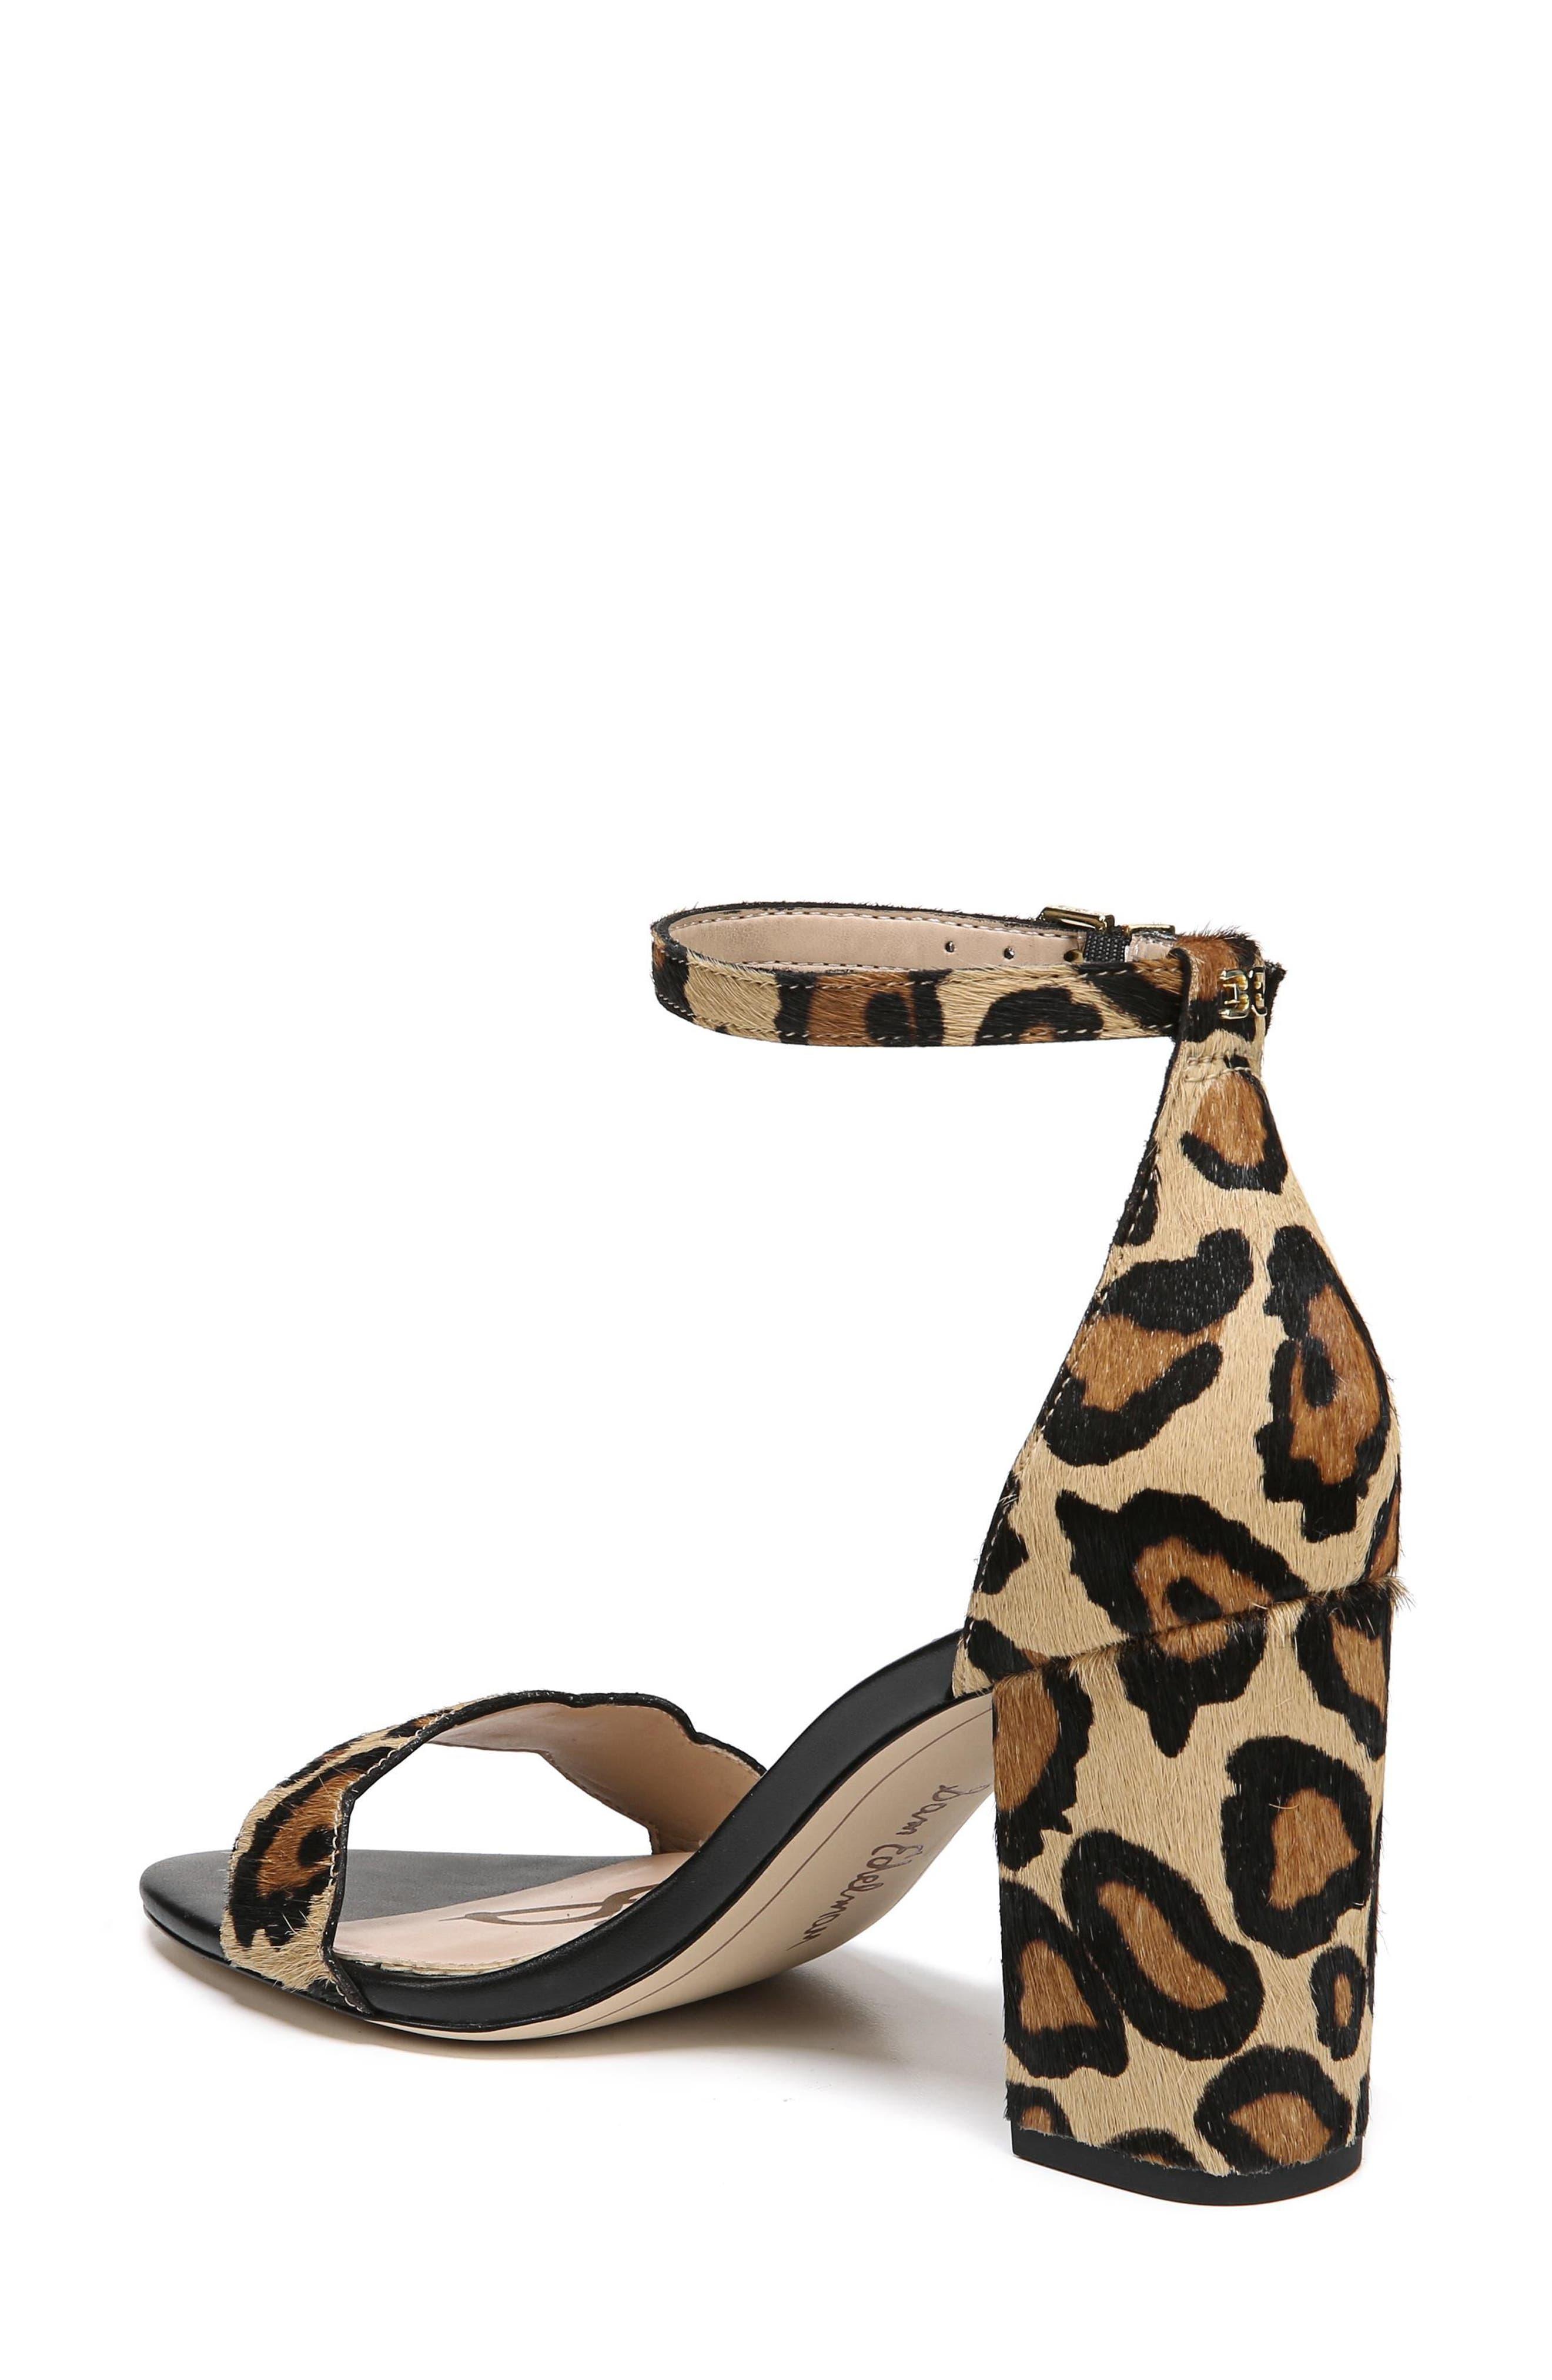 Odila Genuine Calf Hair Sandal,                             Alternate thumbnail 2, color,                             New Nude Leopard Calf Hair